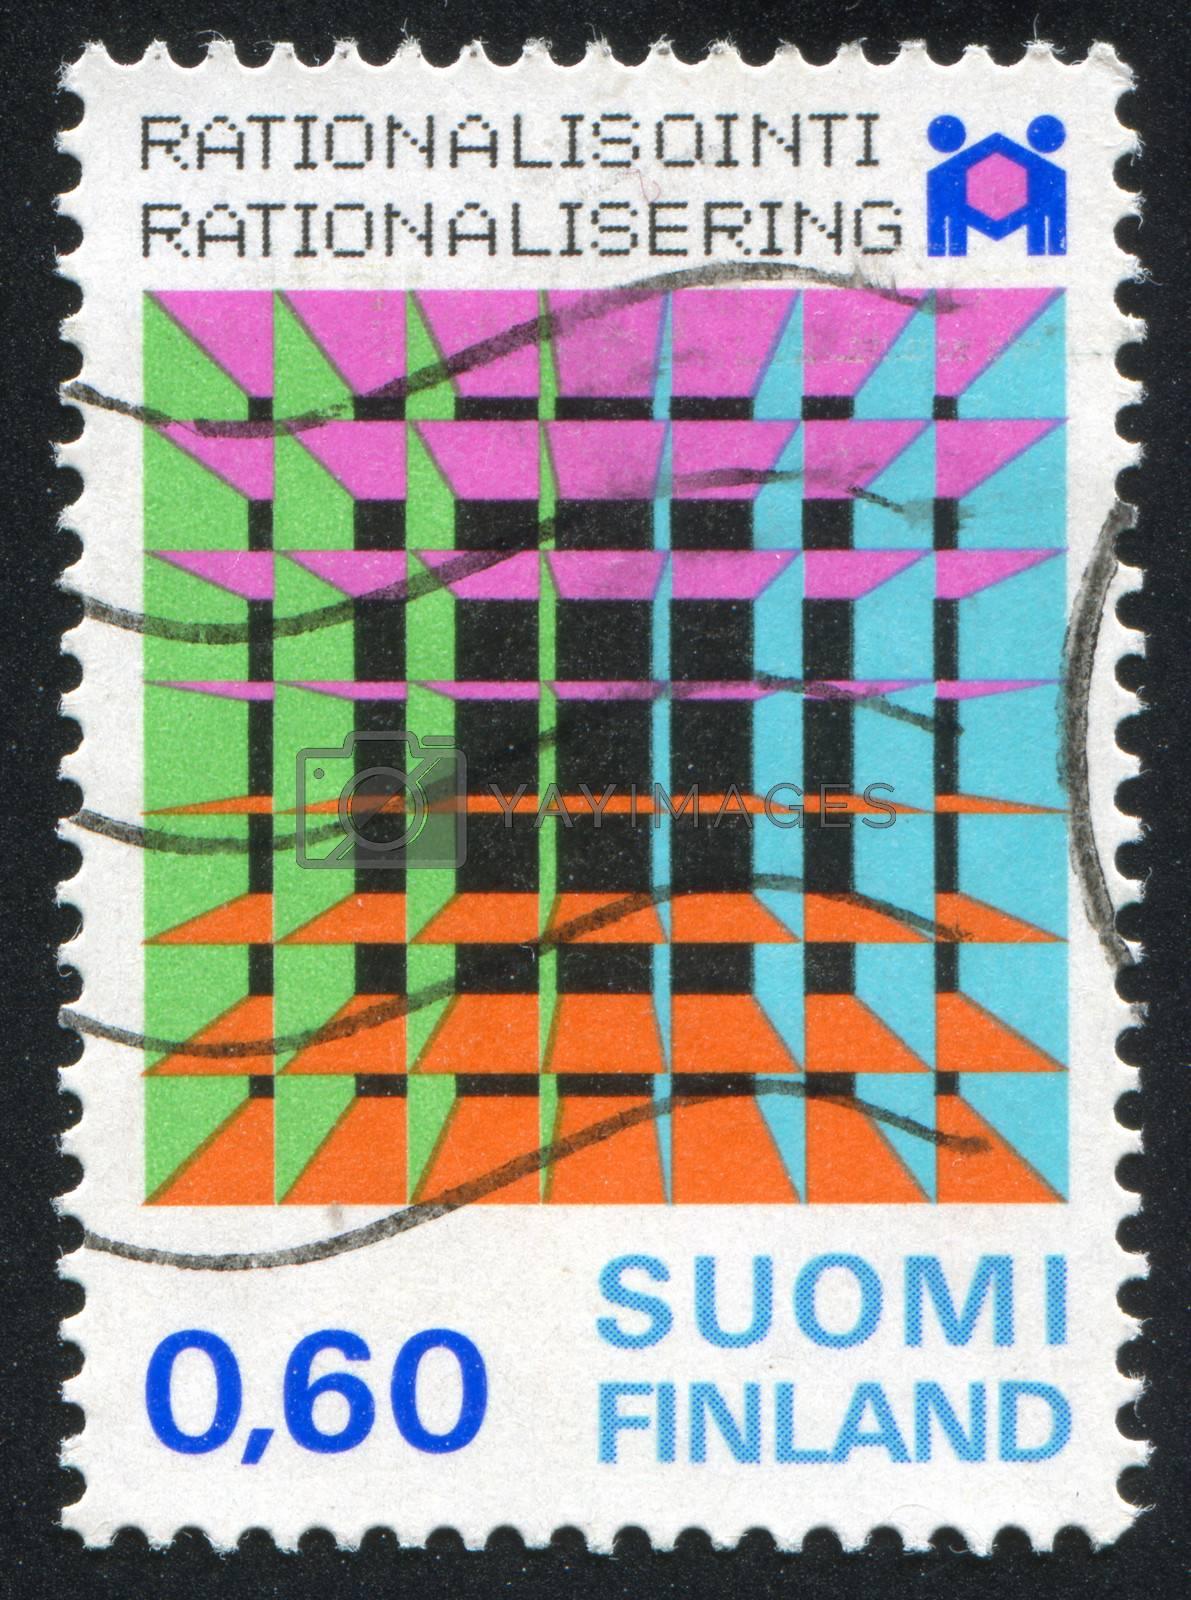 FINLAND - CIRCA 1974: stamp printed by Finland, shows Symbols, Badge, circa 1974